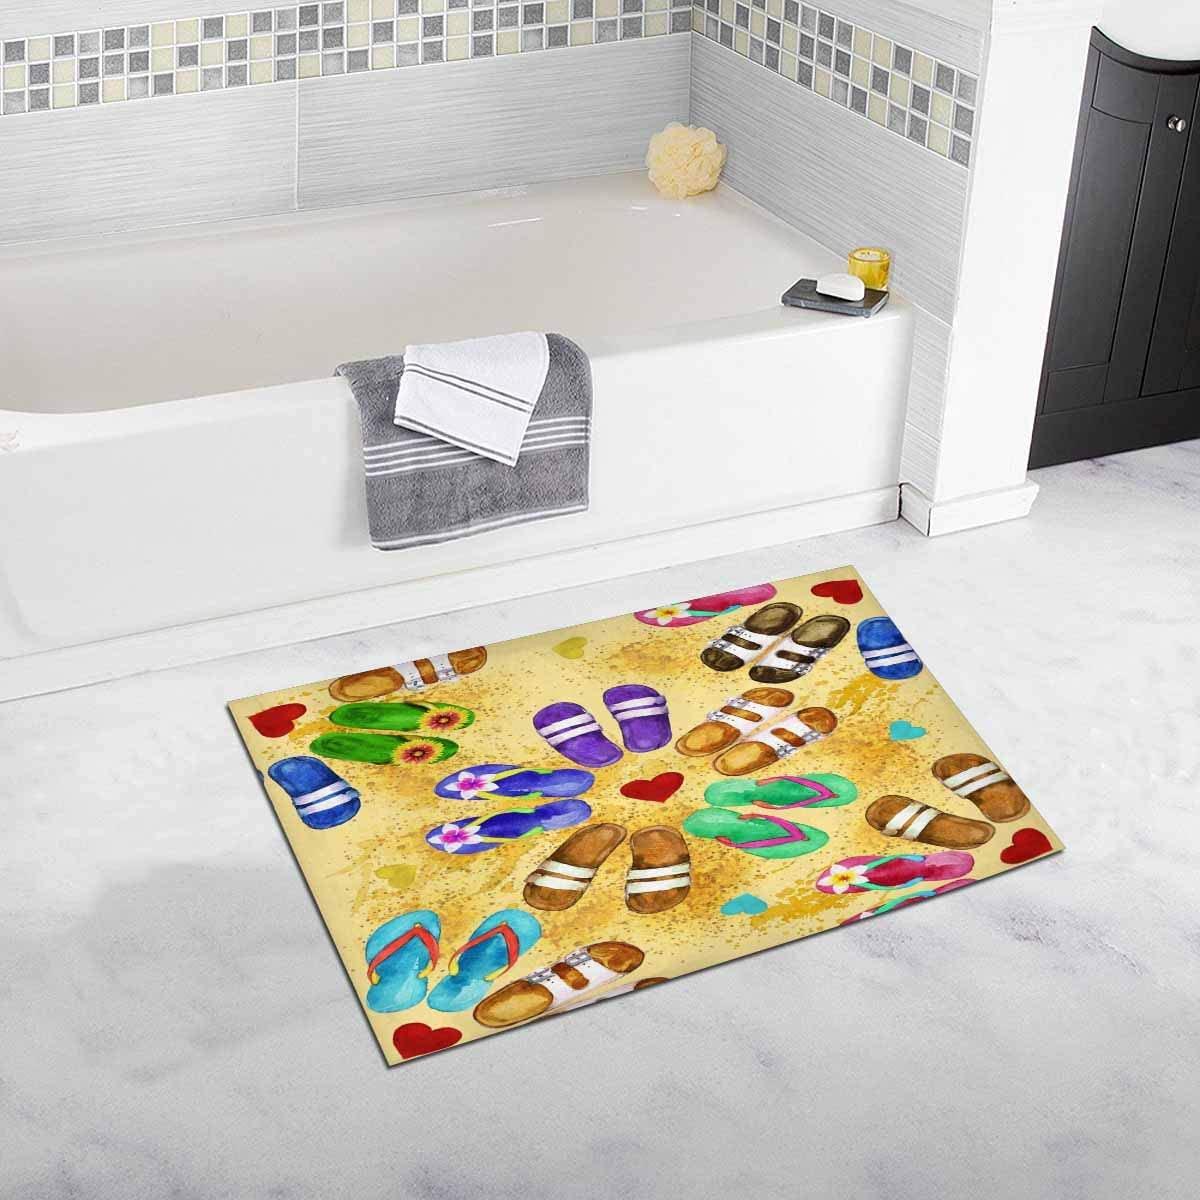 INTERESTPRINT Flip Flops Bath Mat Non-Slip Bathroom X-Large Size 20 X 32 Inches